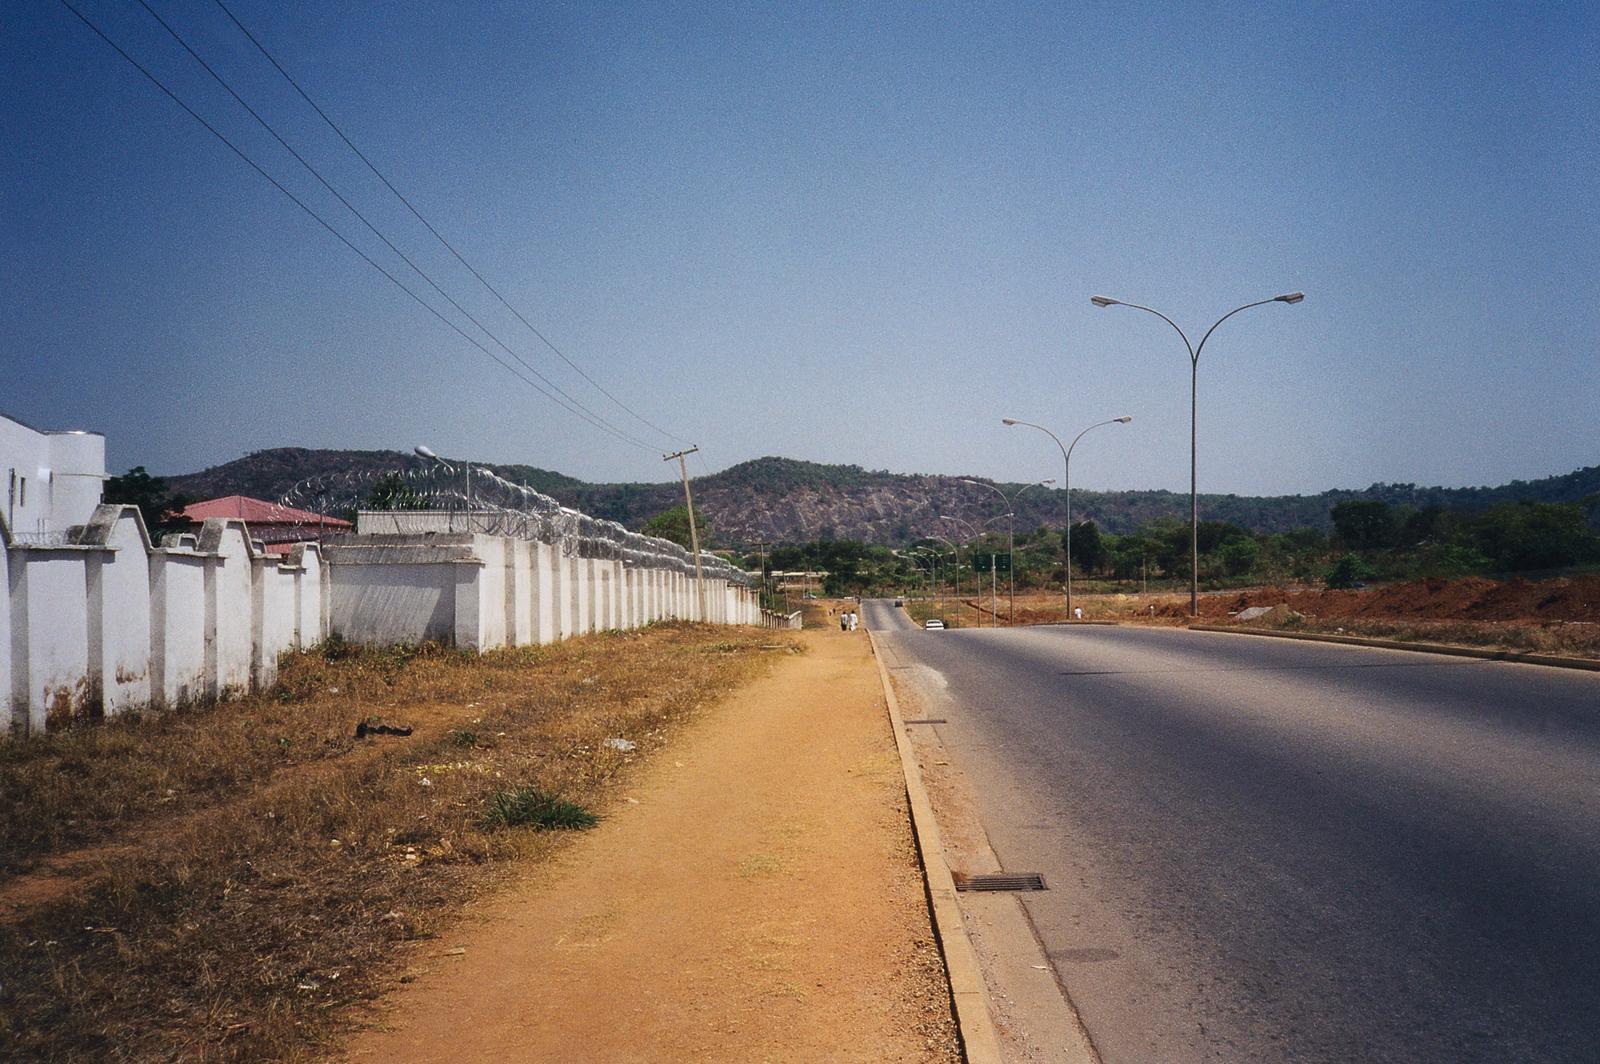 Abuja - Annex Office Building - 1991